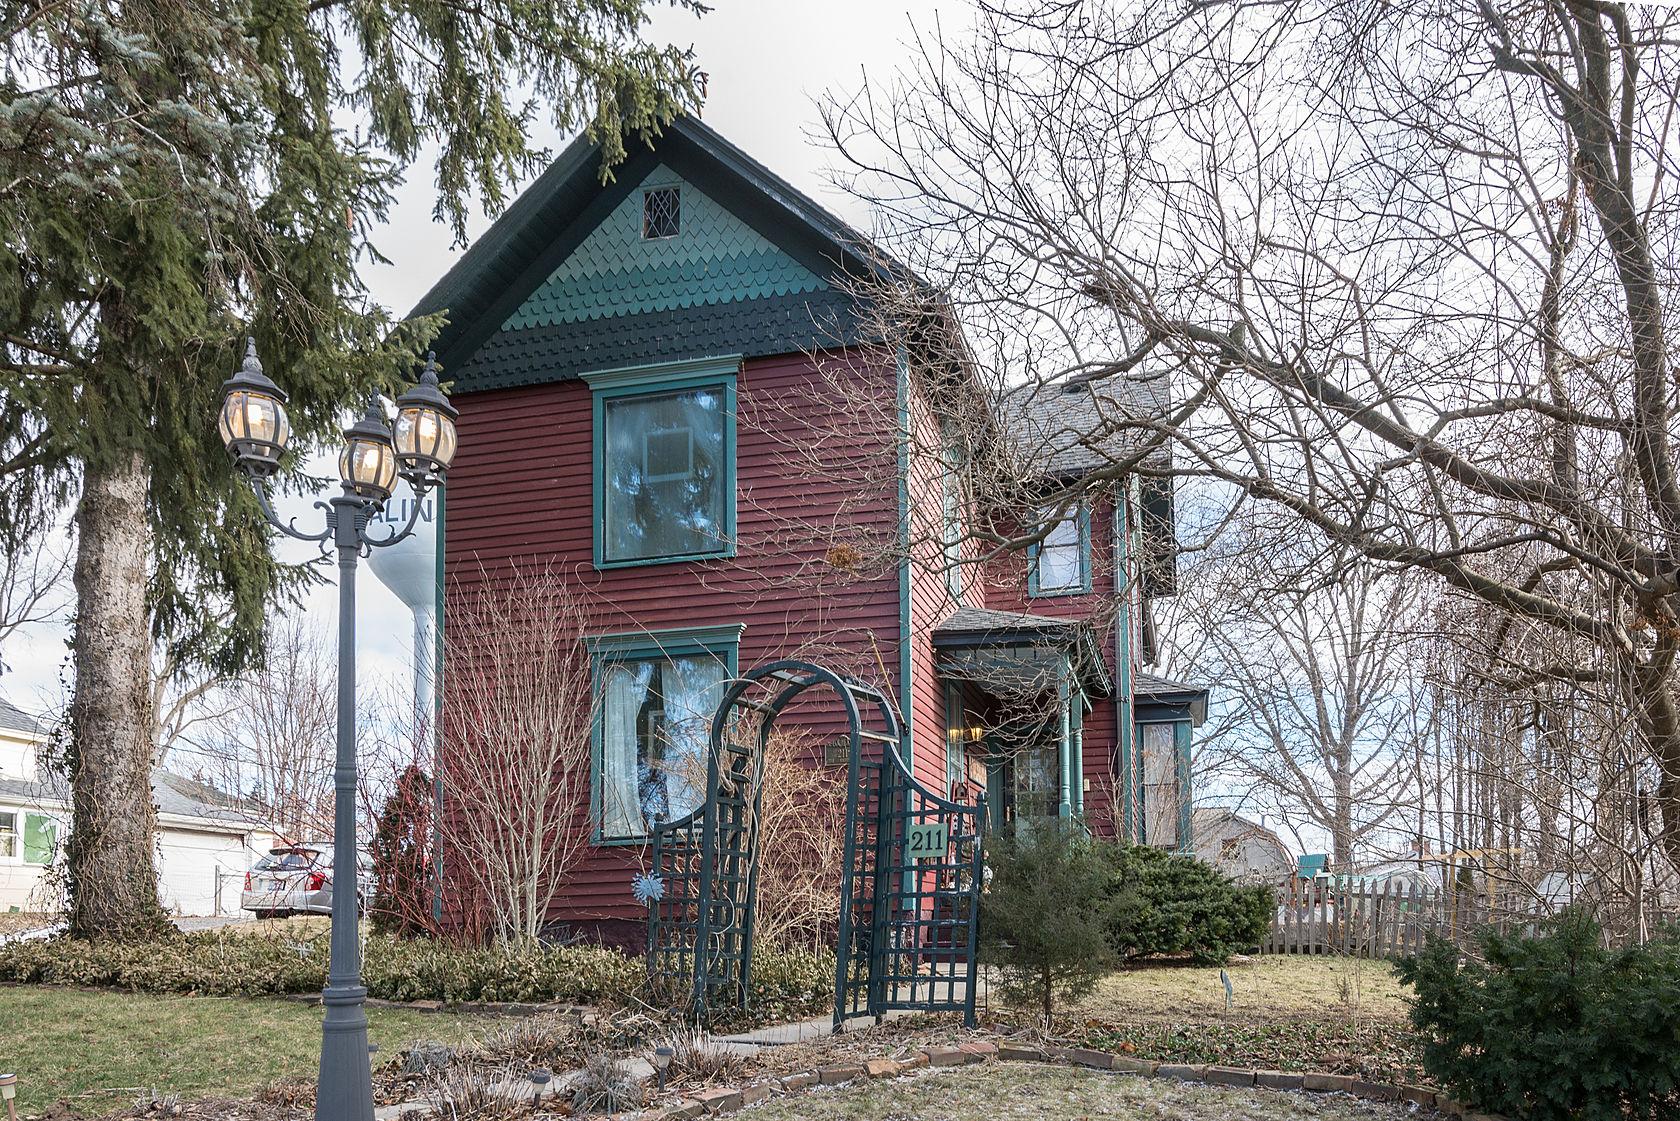 211 S Ann Arbor St, Saline, MI 48176-1303